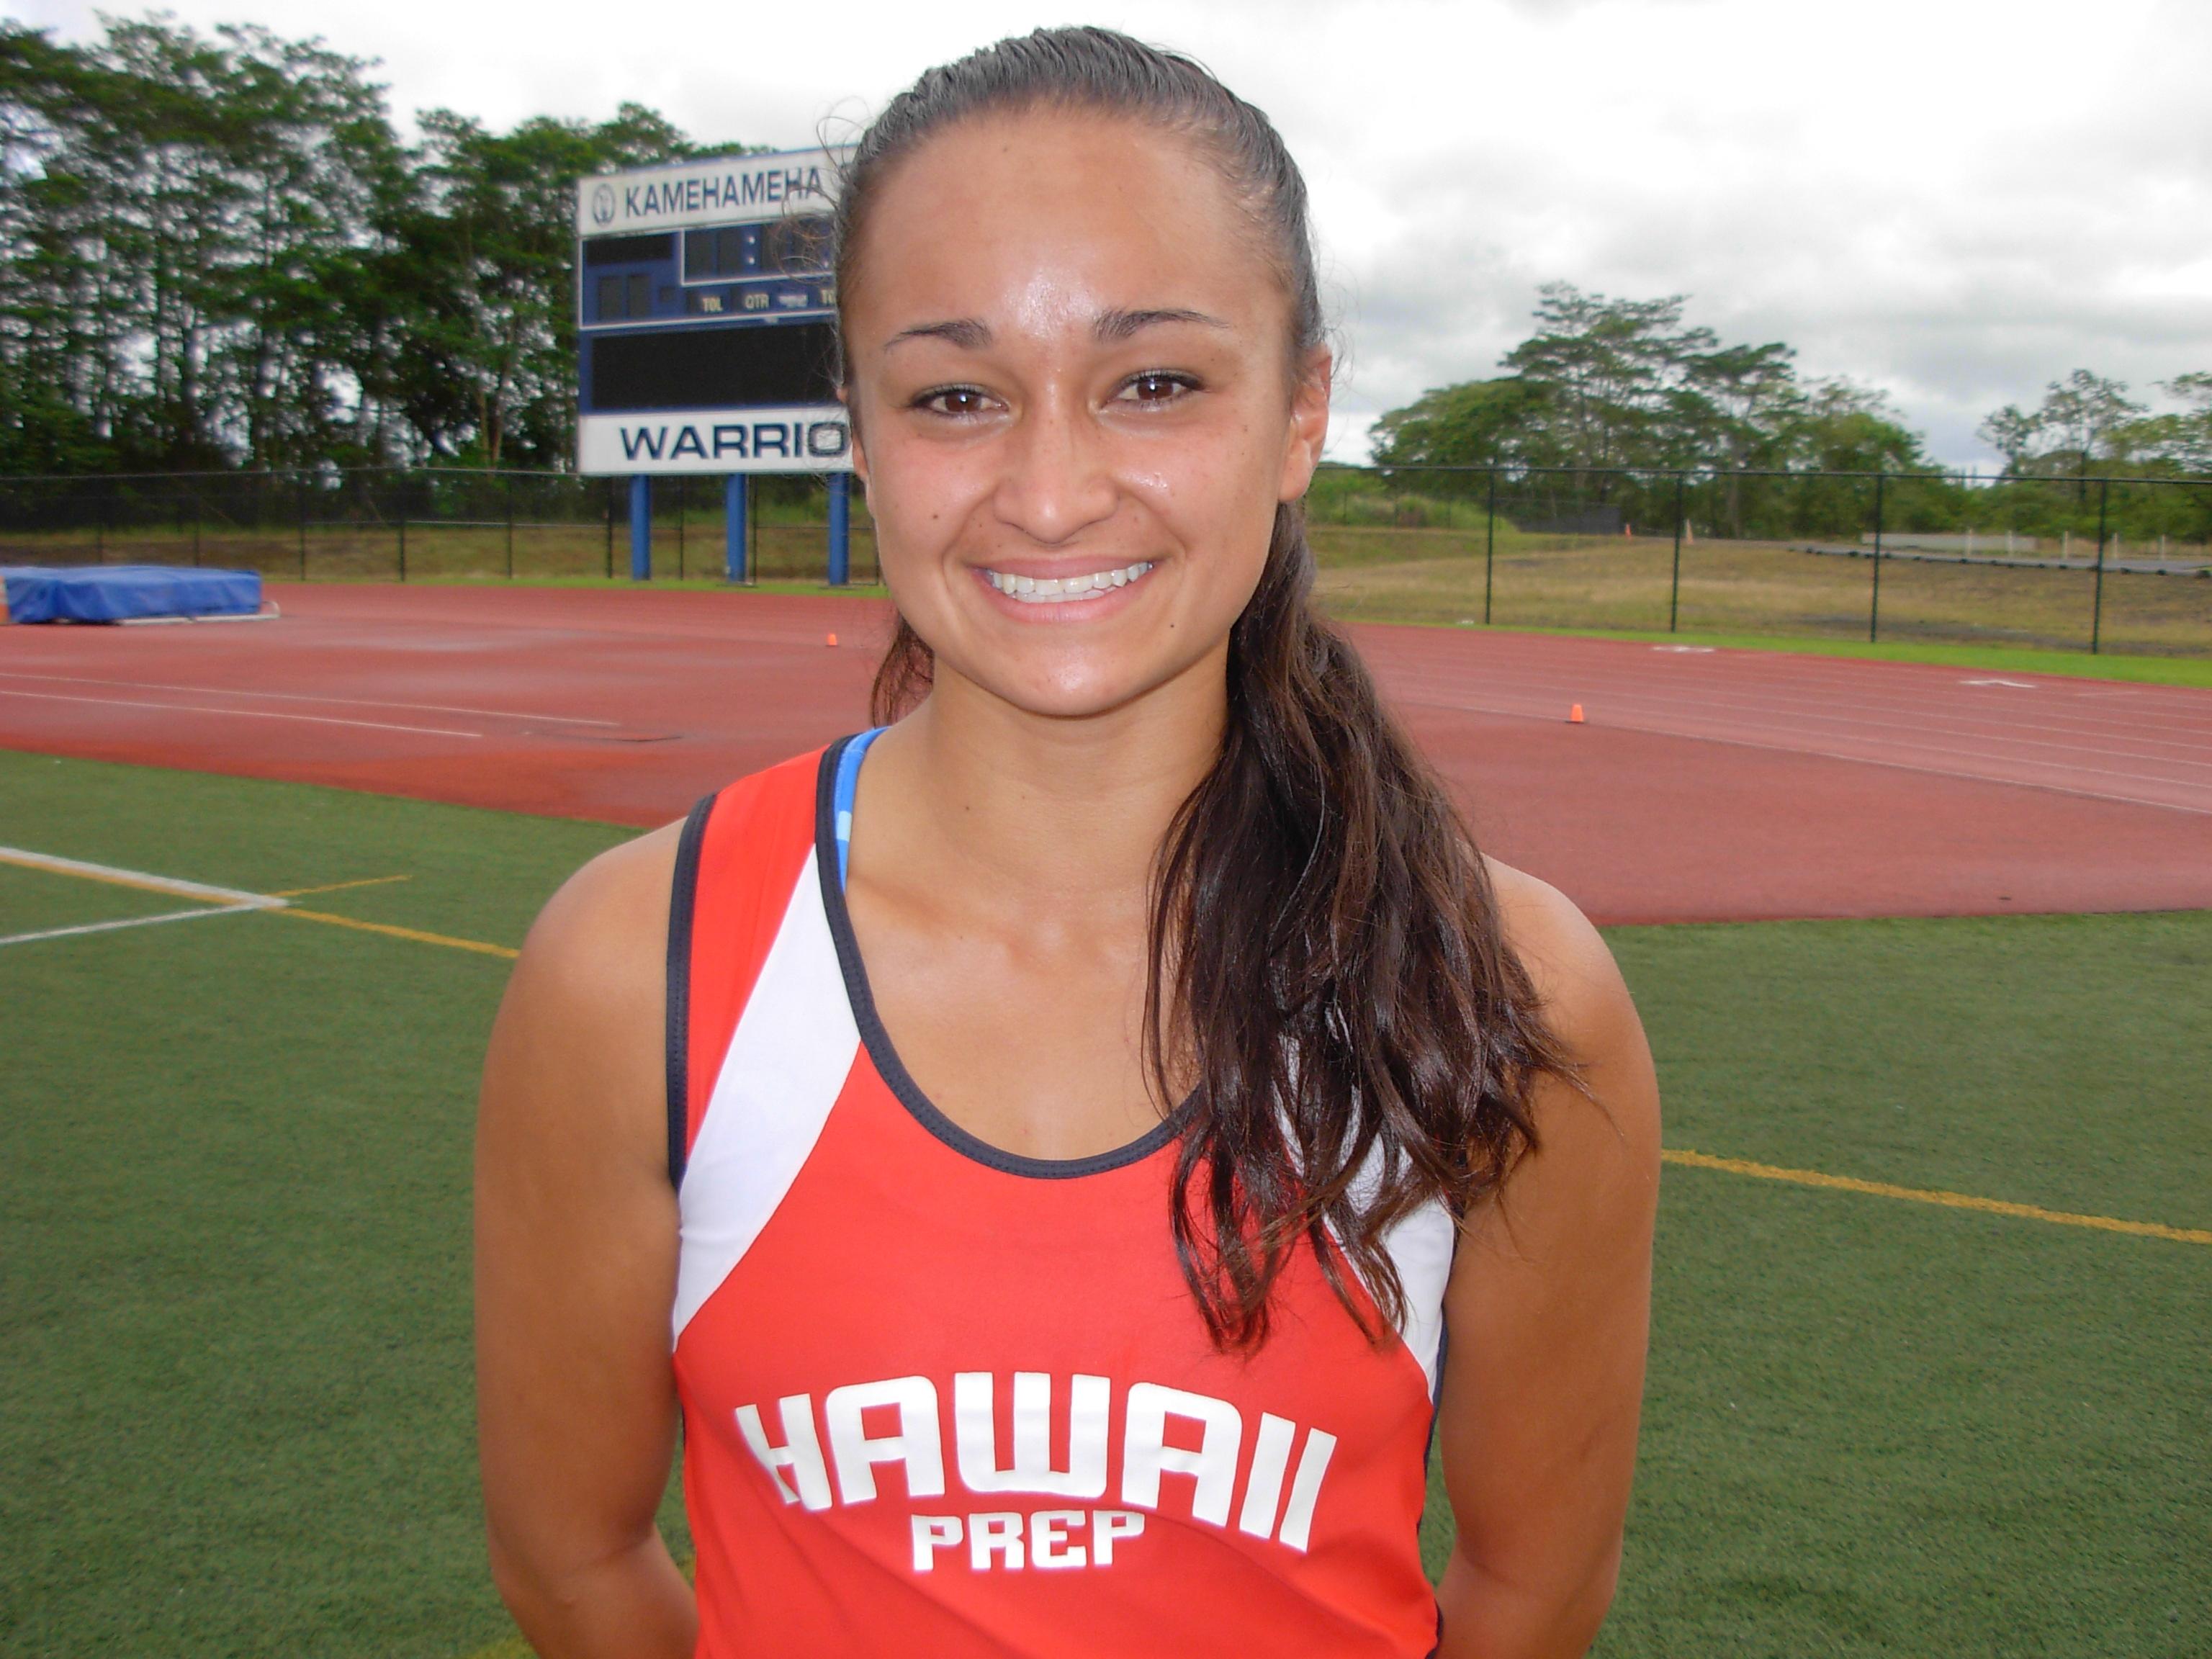 kealakekua single girls 5/11&12 hhsa track championships tbd konawaena meet 3-10-18 kealakekua hawaii 96750 telephone: (808) 323-4500.